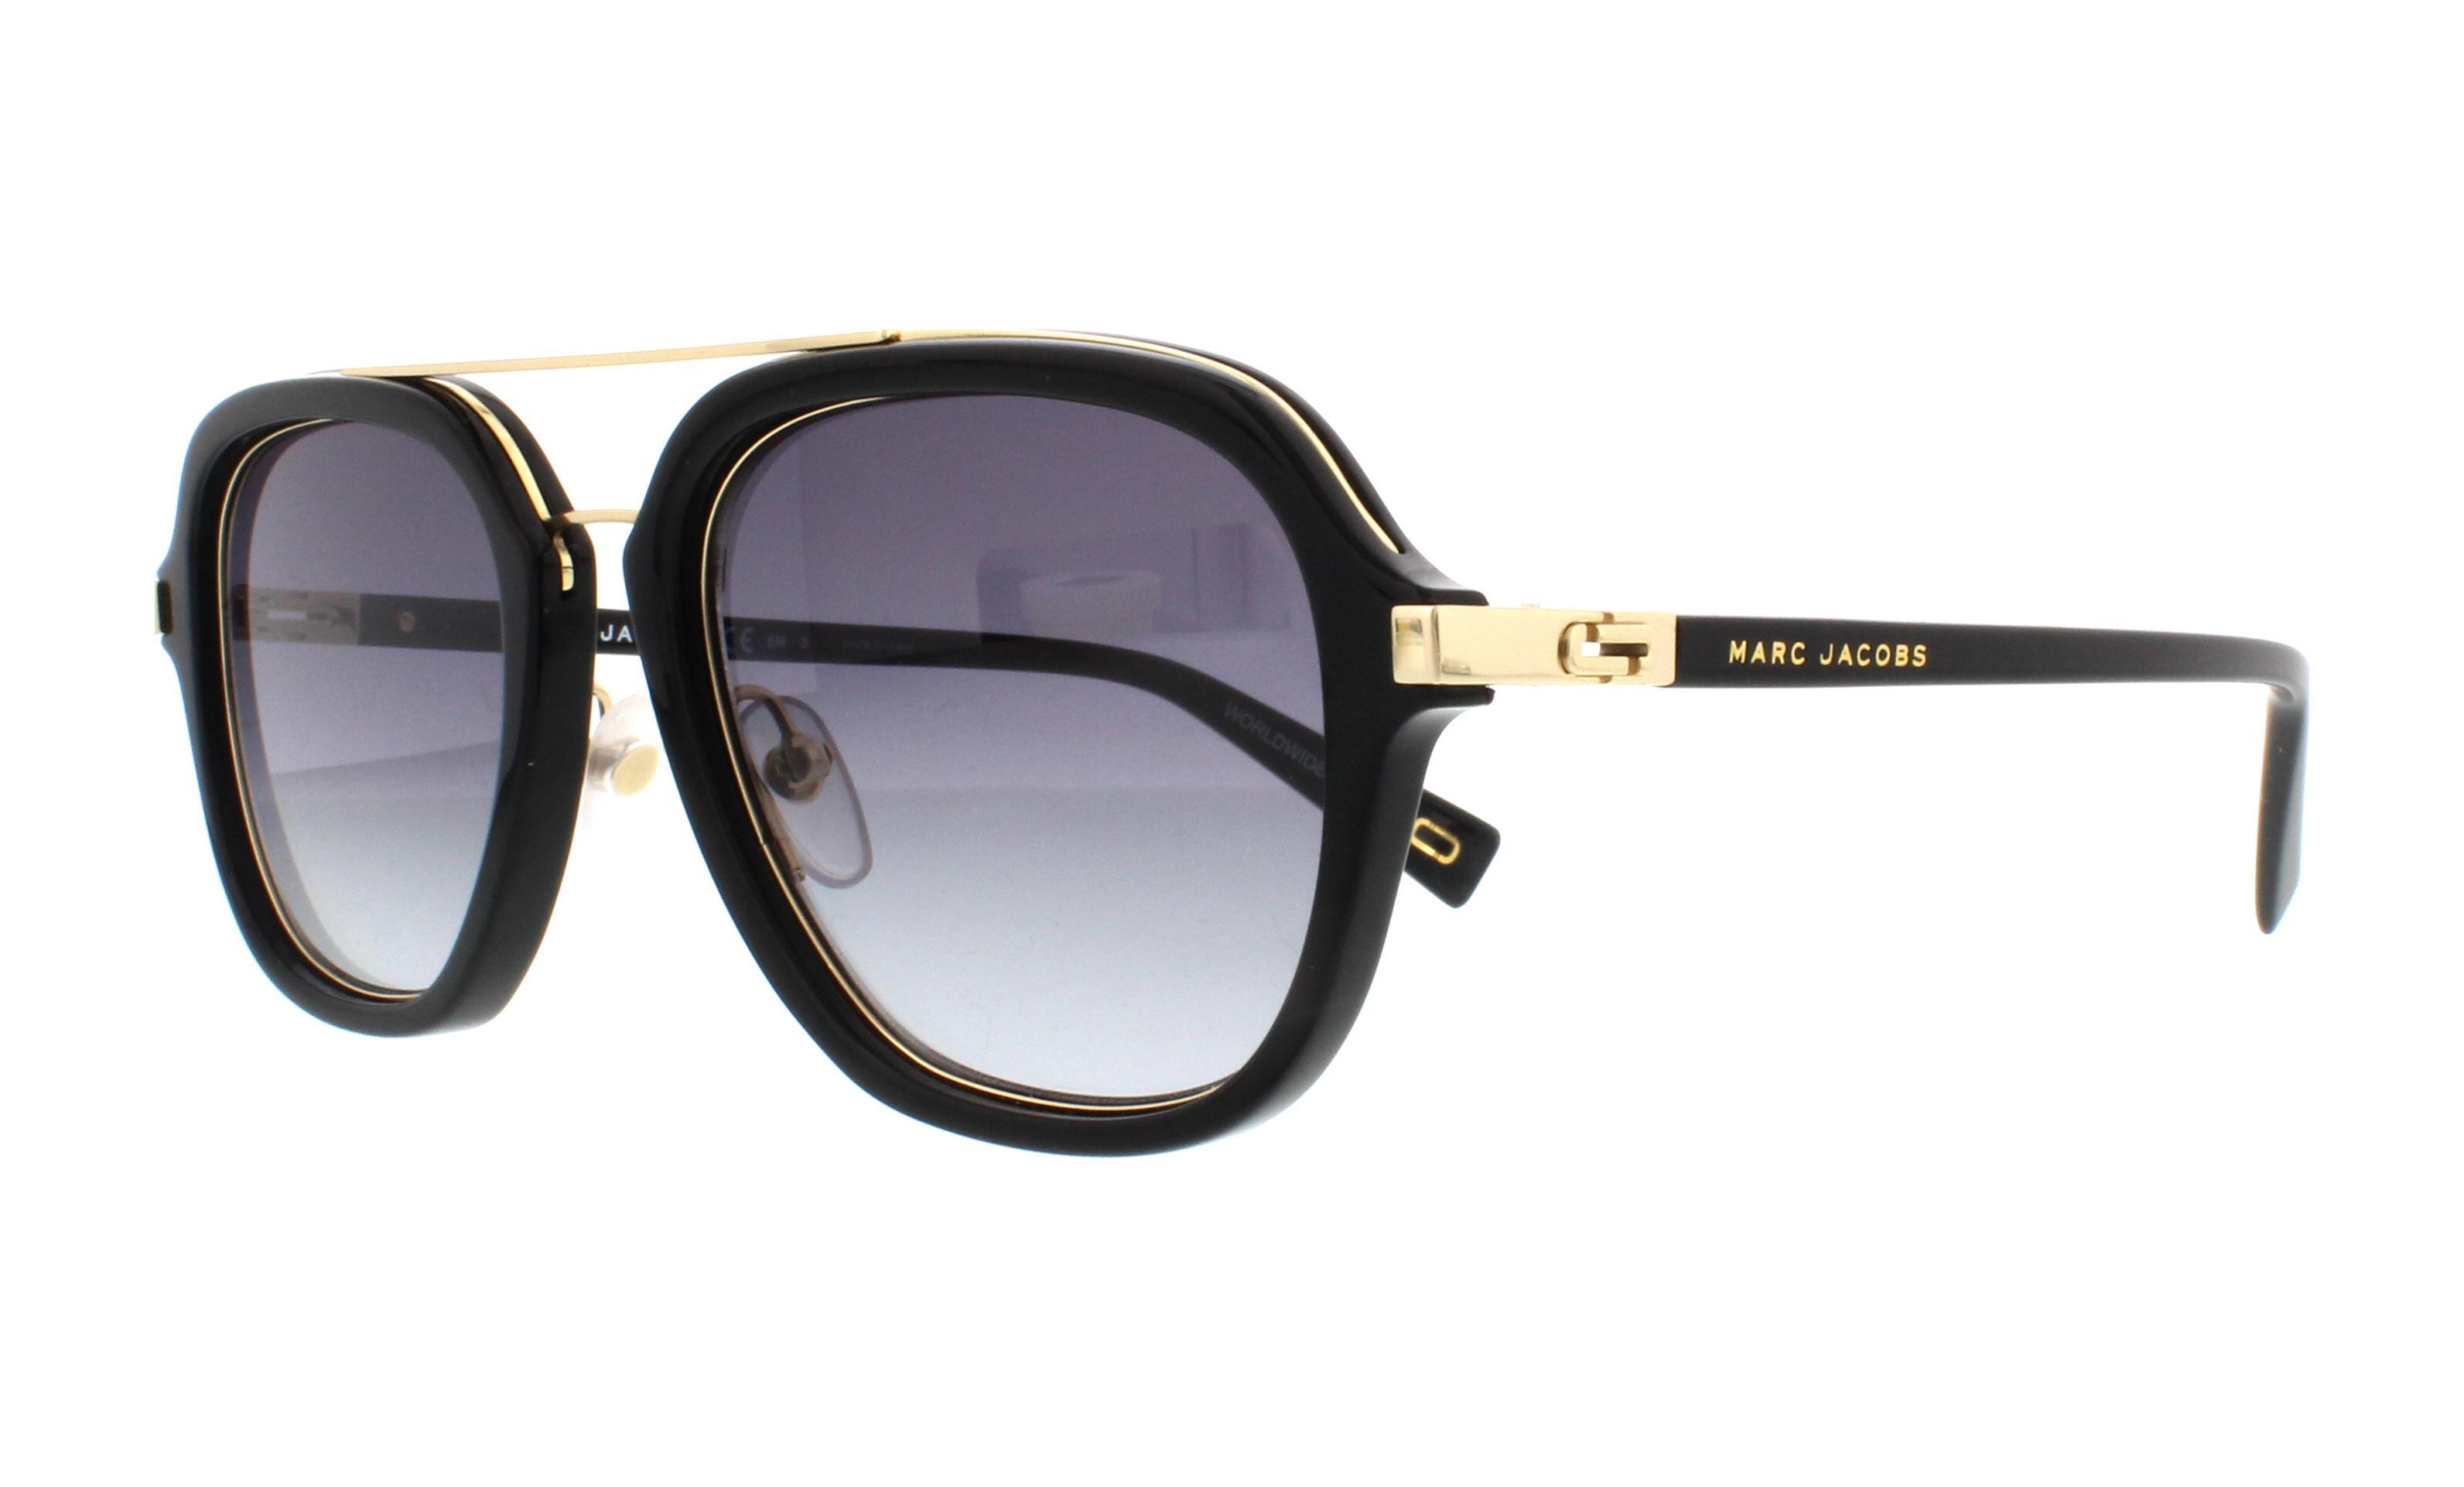 MARC JACOBS Sunglasses MARC 172 S 02M2 Black Gold 54MM 762753684899 ... 9cb28563cd07